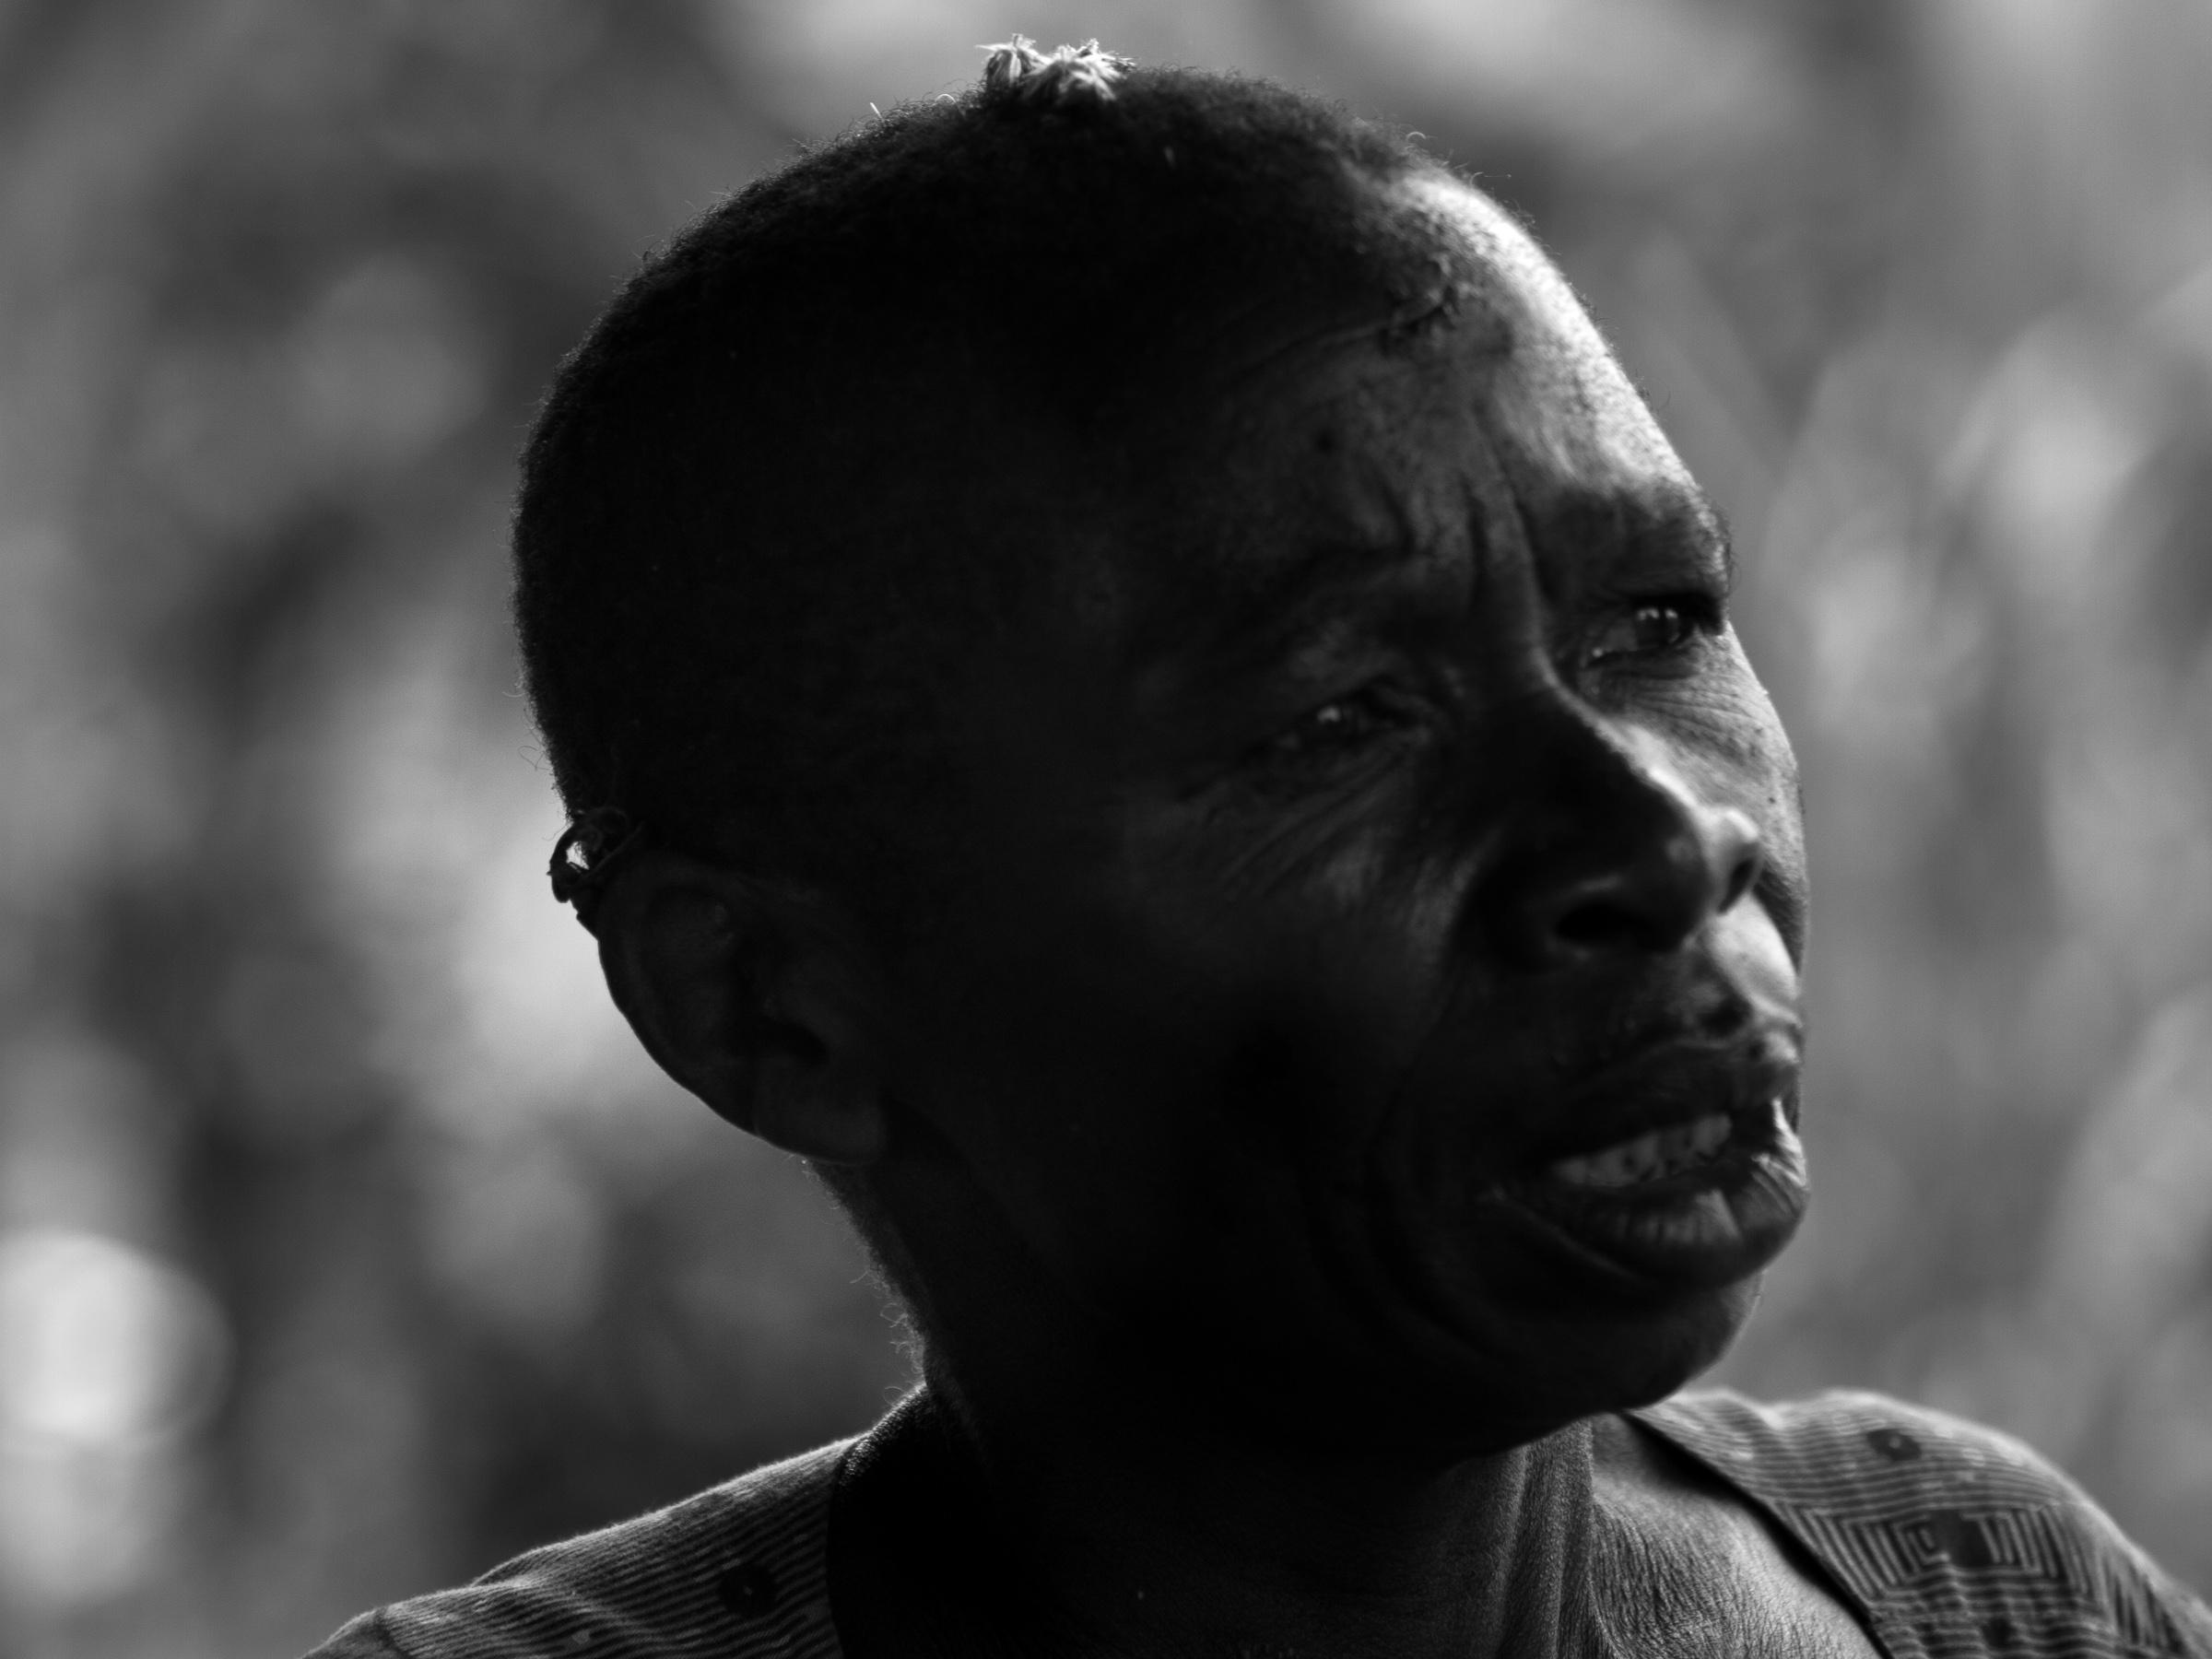 Emiliano Tidona_Series Nord Kivu Portraits_Untitled 2.jpg